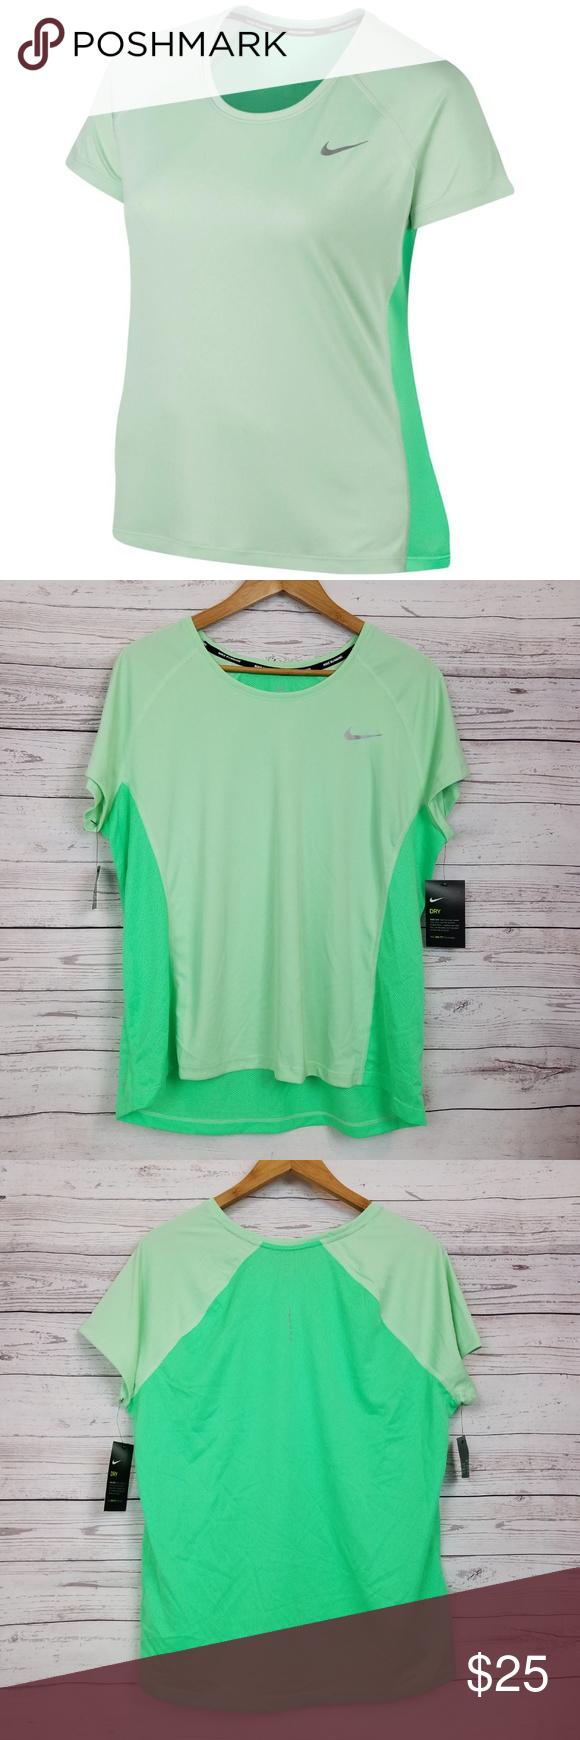 4aa4ba15890ed NWT Nike Miler Shirt Top Plus 1X Green Dri Fit Nike Womens Miler Shirt Top  Size - 1X Color - Green (Fresh Mint/Electro Green) Short sleeve Dri fit  Moisture ...